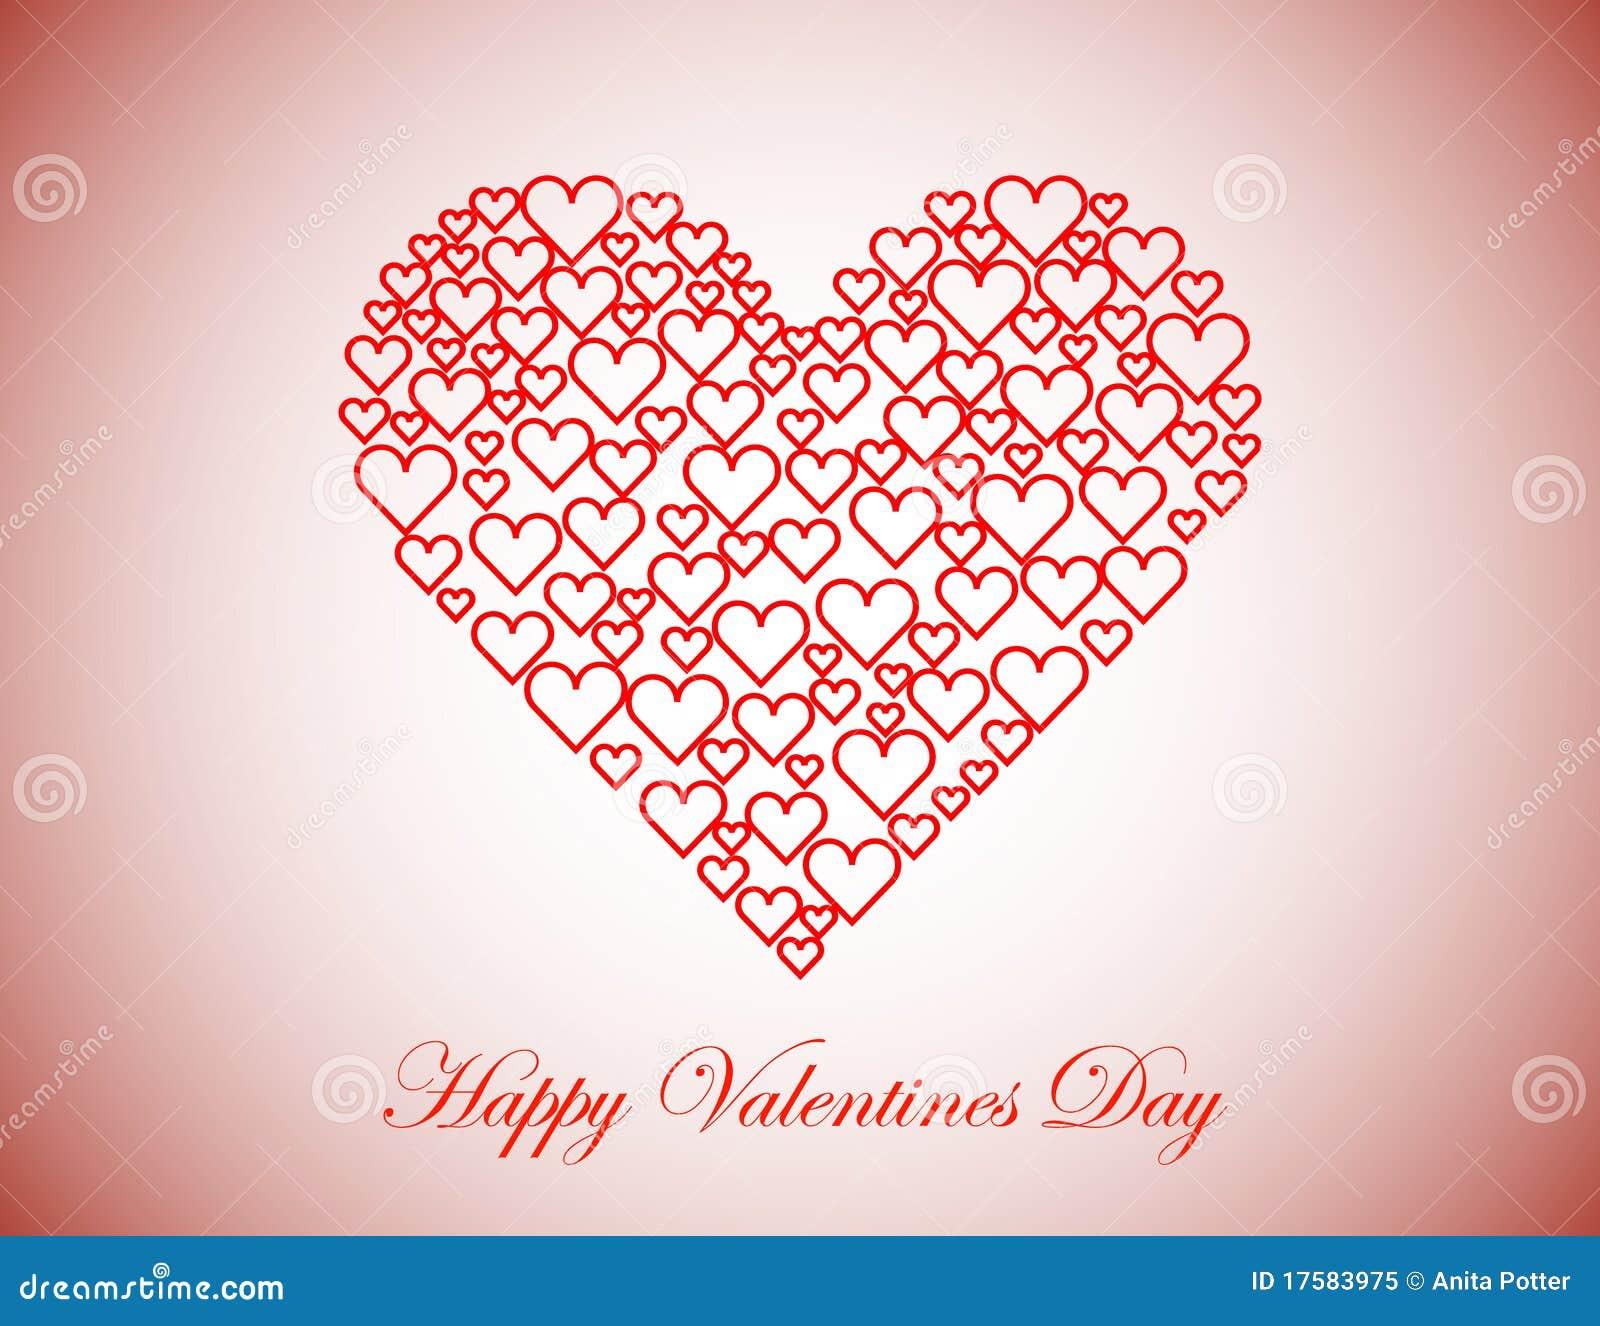 Happy Valentines Day Animation Free